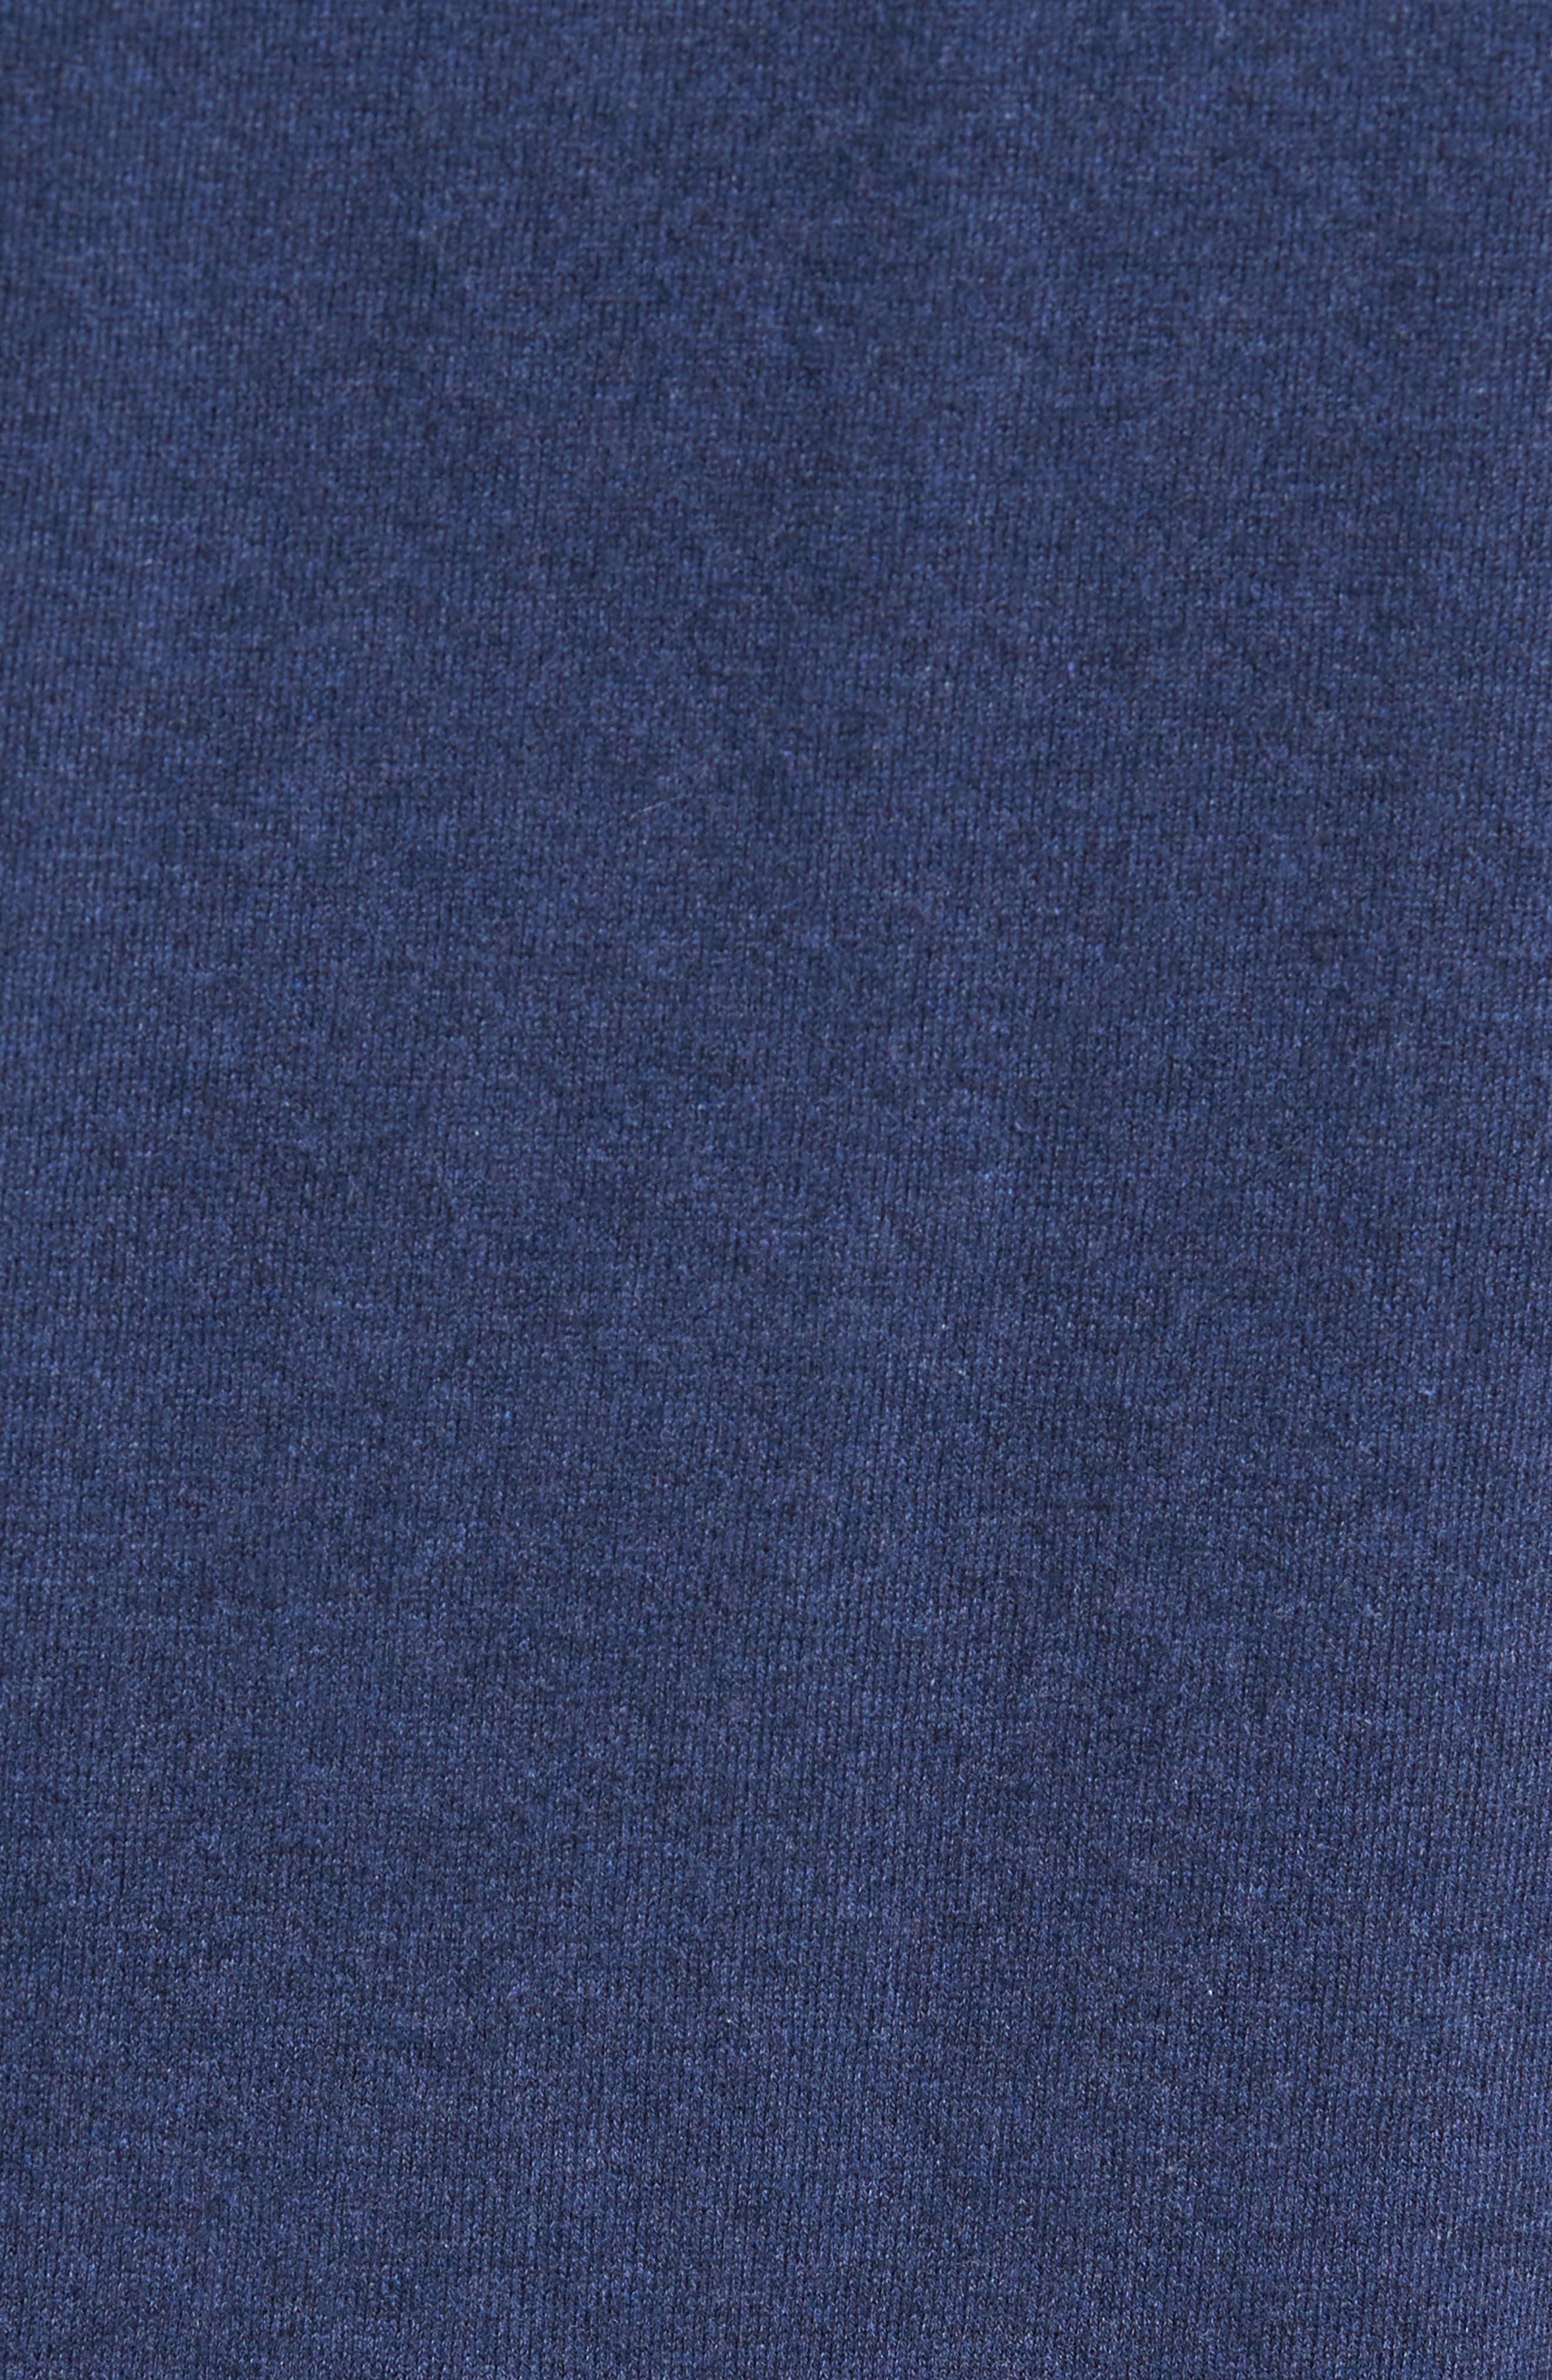 Regular Fit Stretch Cotton Sweater,                             Alternate thumbnail 5, color,                             INDIGO MELANGE